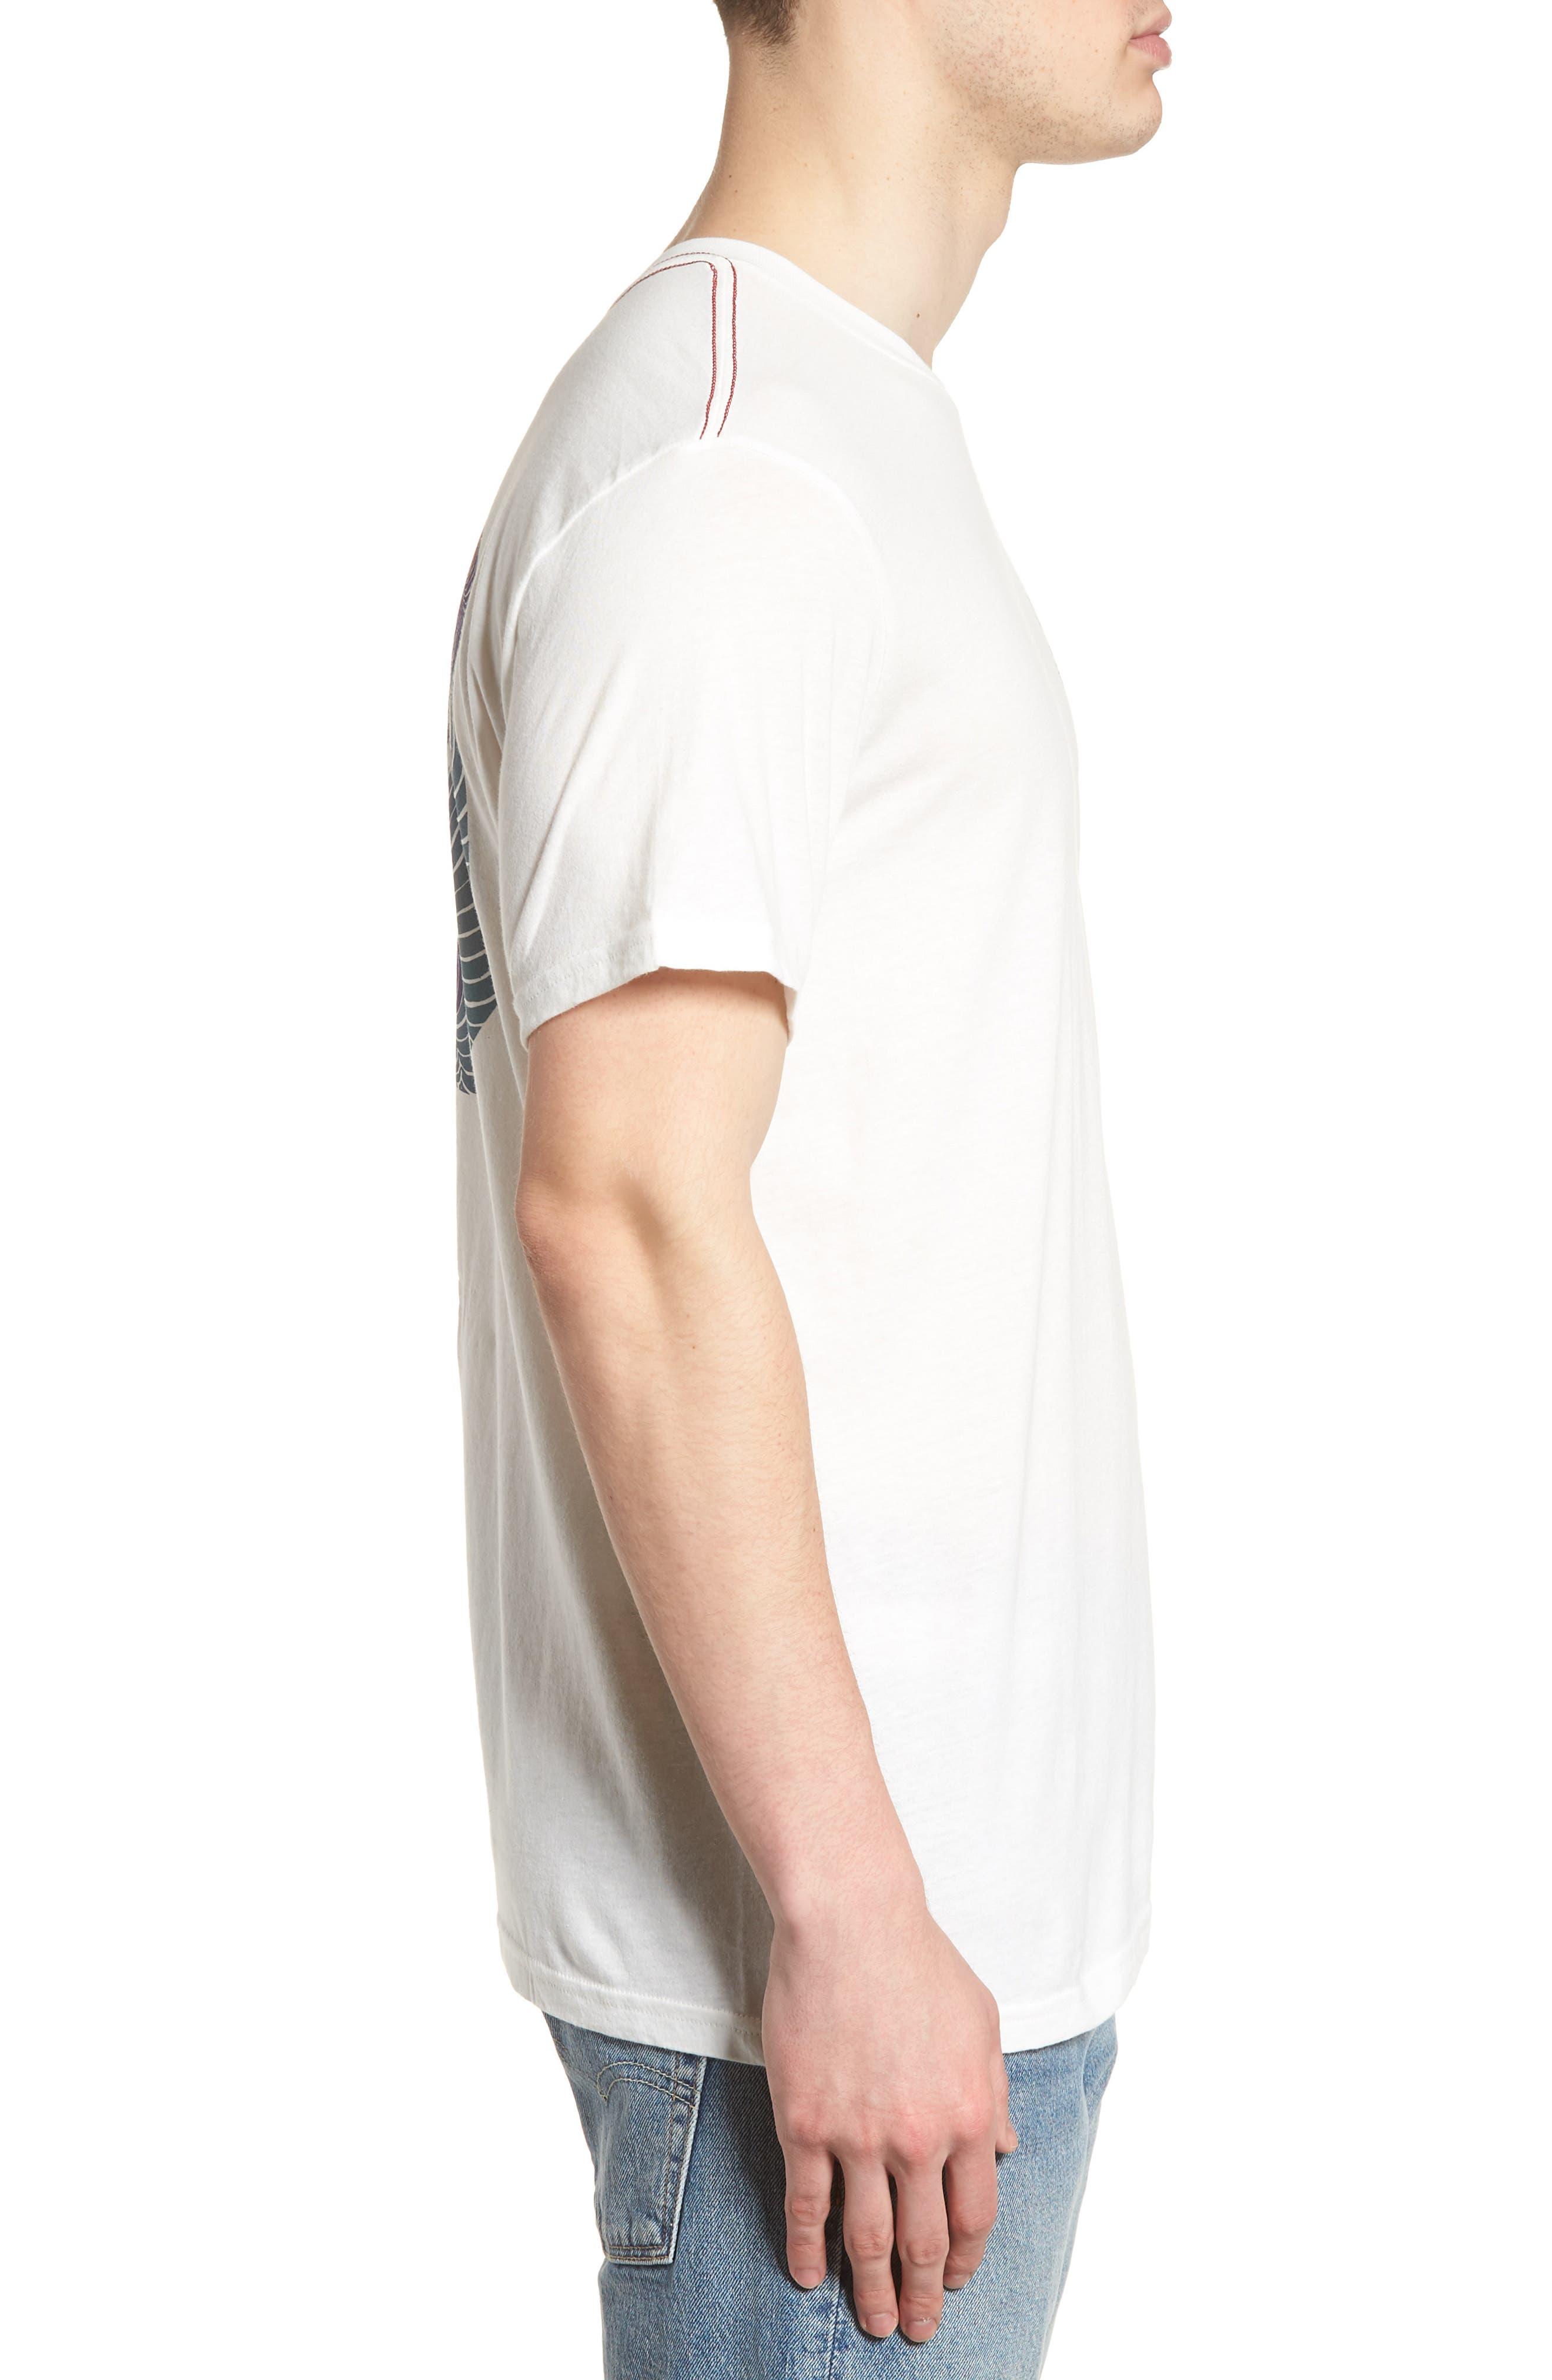 Kelsey ANP Motors T-Shirt,                             Alternate thumbnail 3, color,                             Ivory